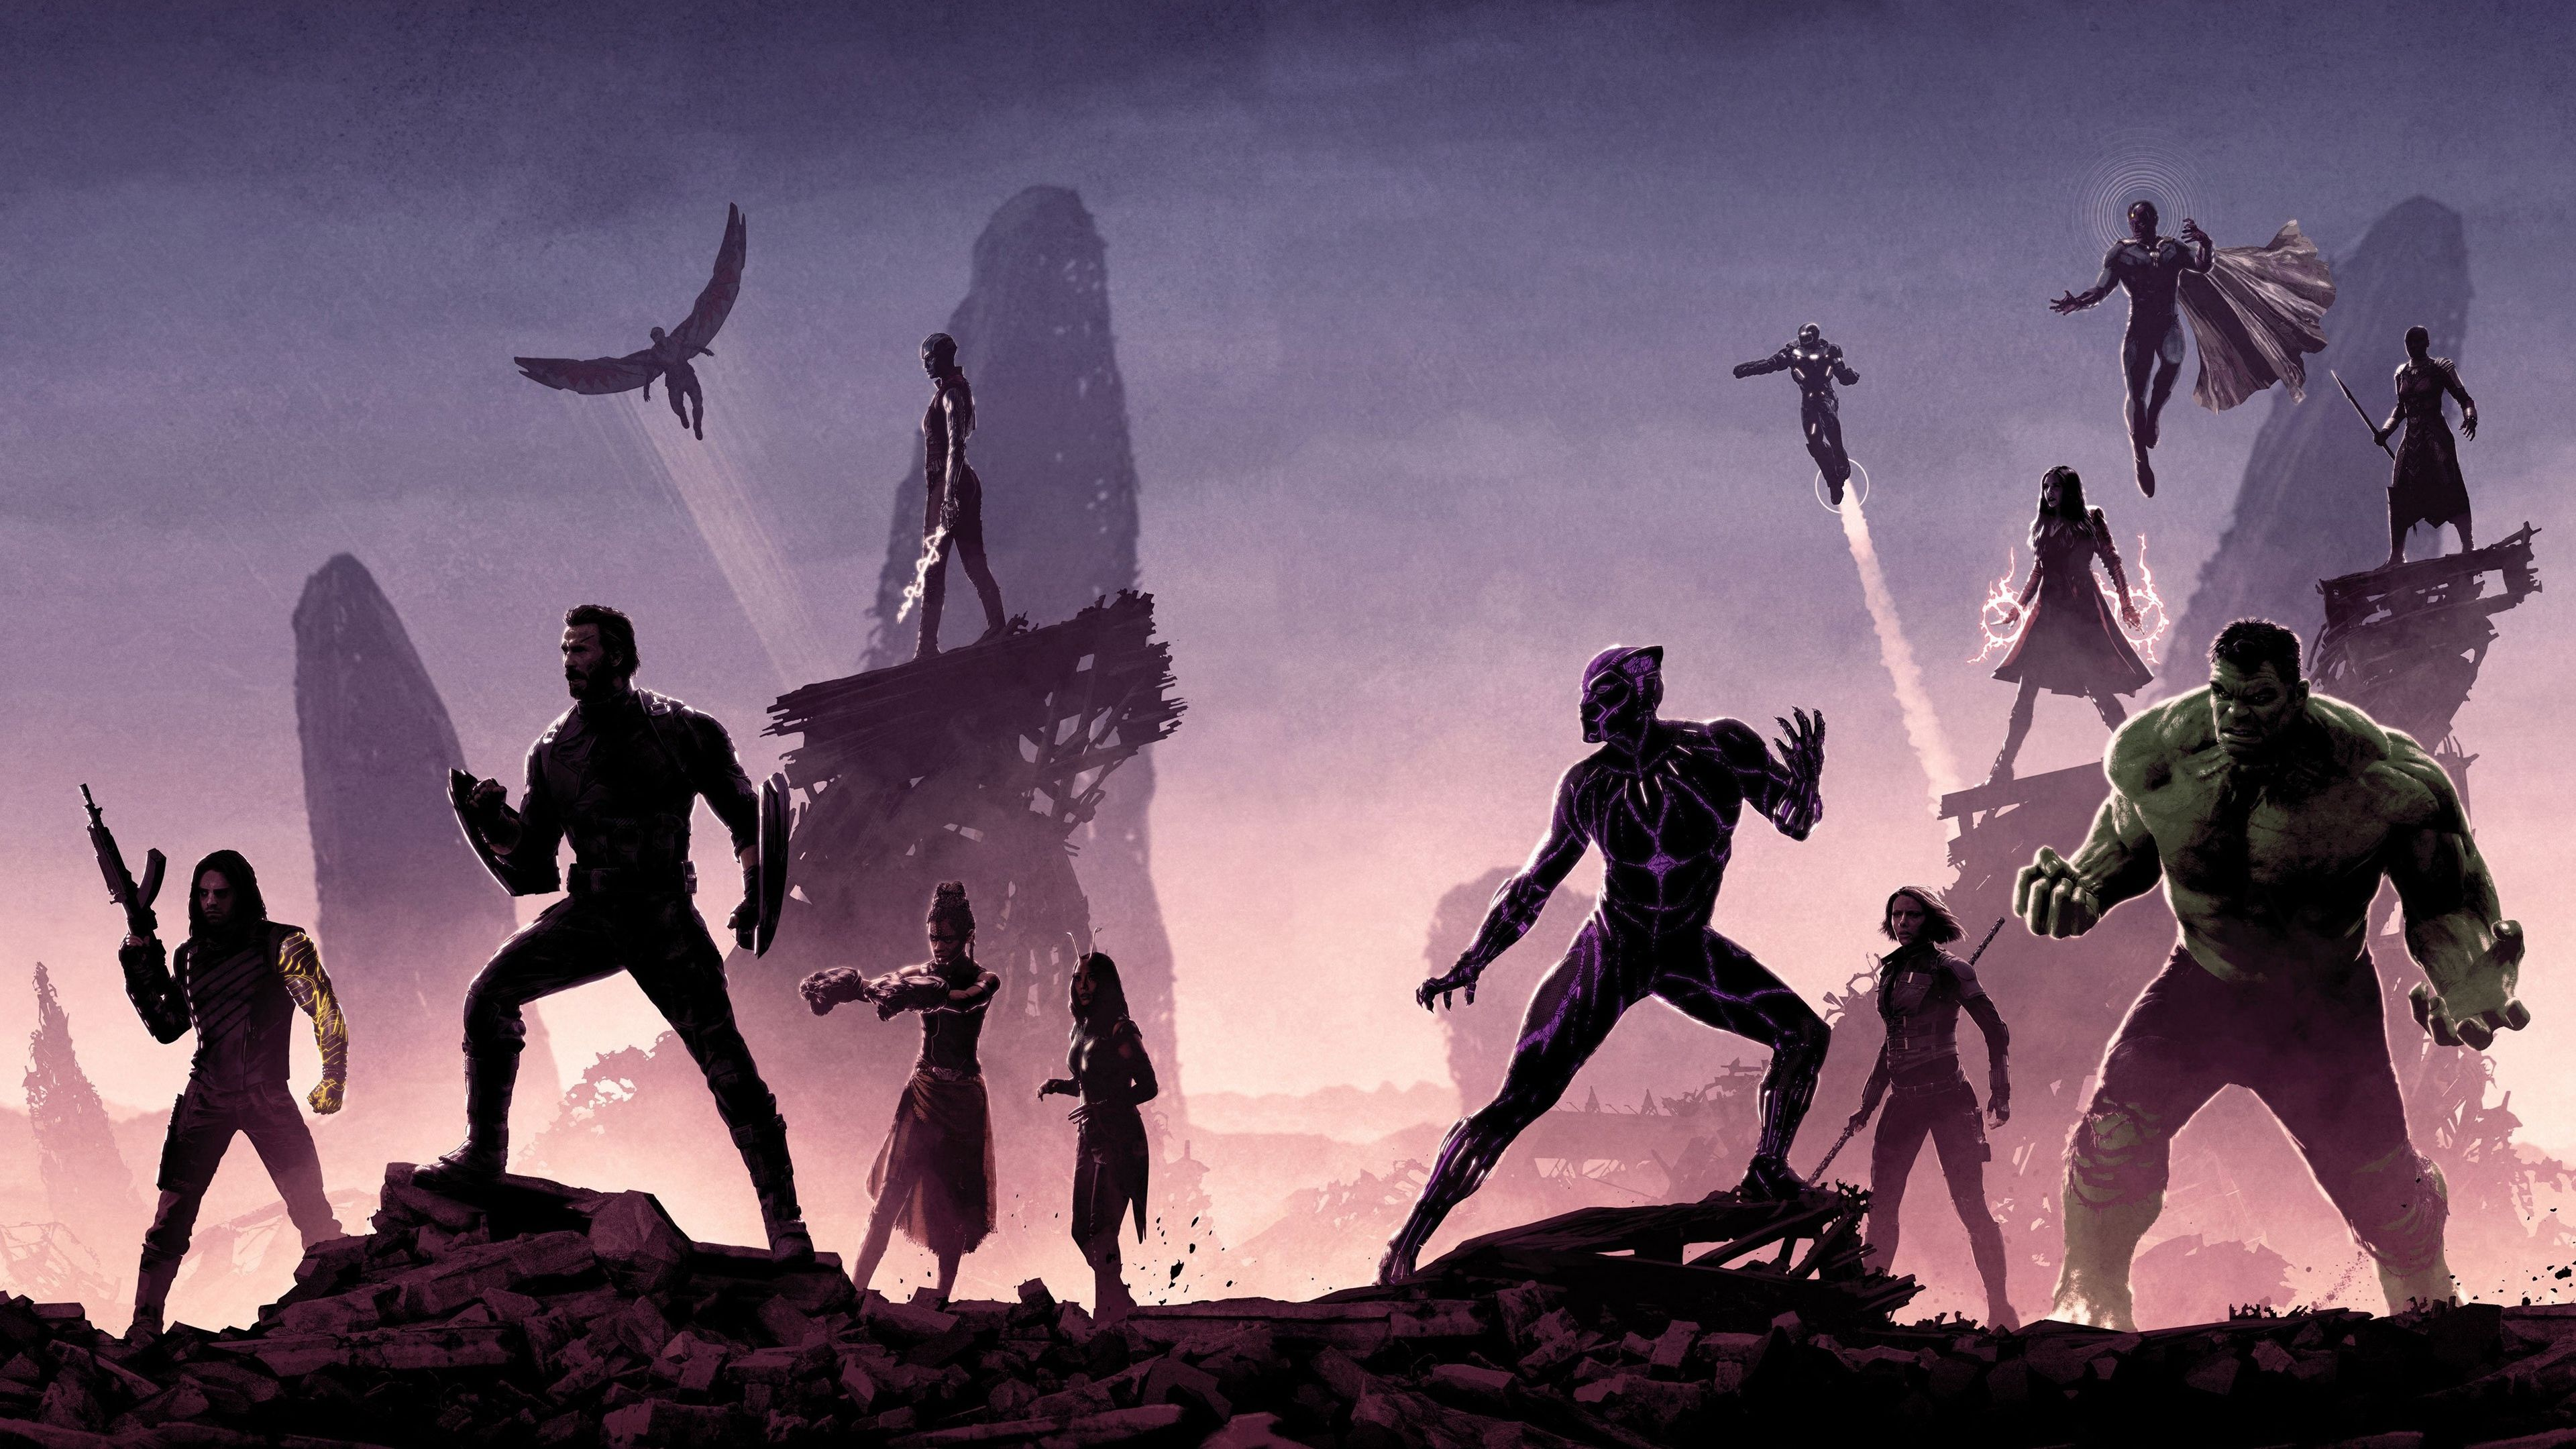 Avengers Infinity War Movie 2018 Minimalist The Hulk Black Panther Captain America Wh Marvel Comics Wallpaper Avengers Infinity War Black Panther Marvel